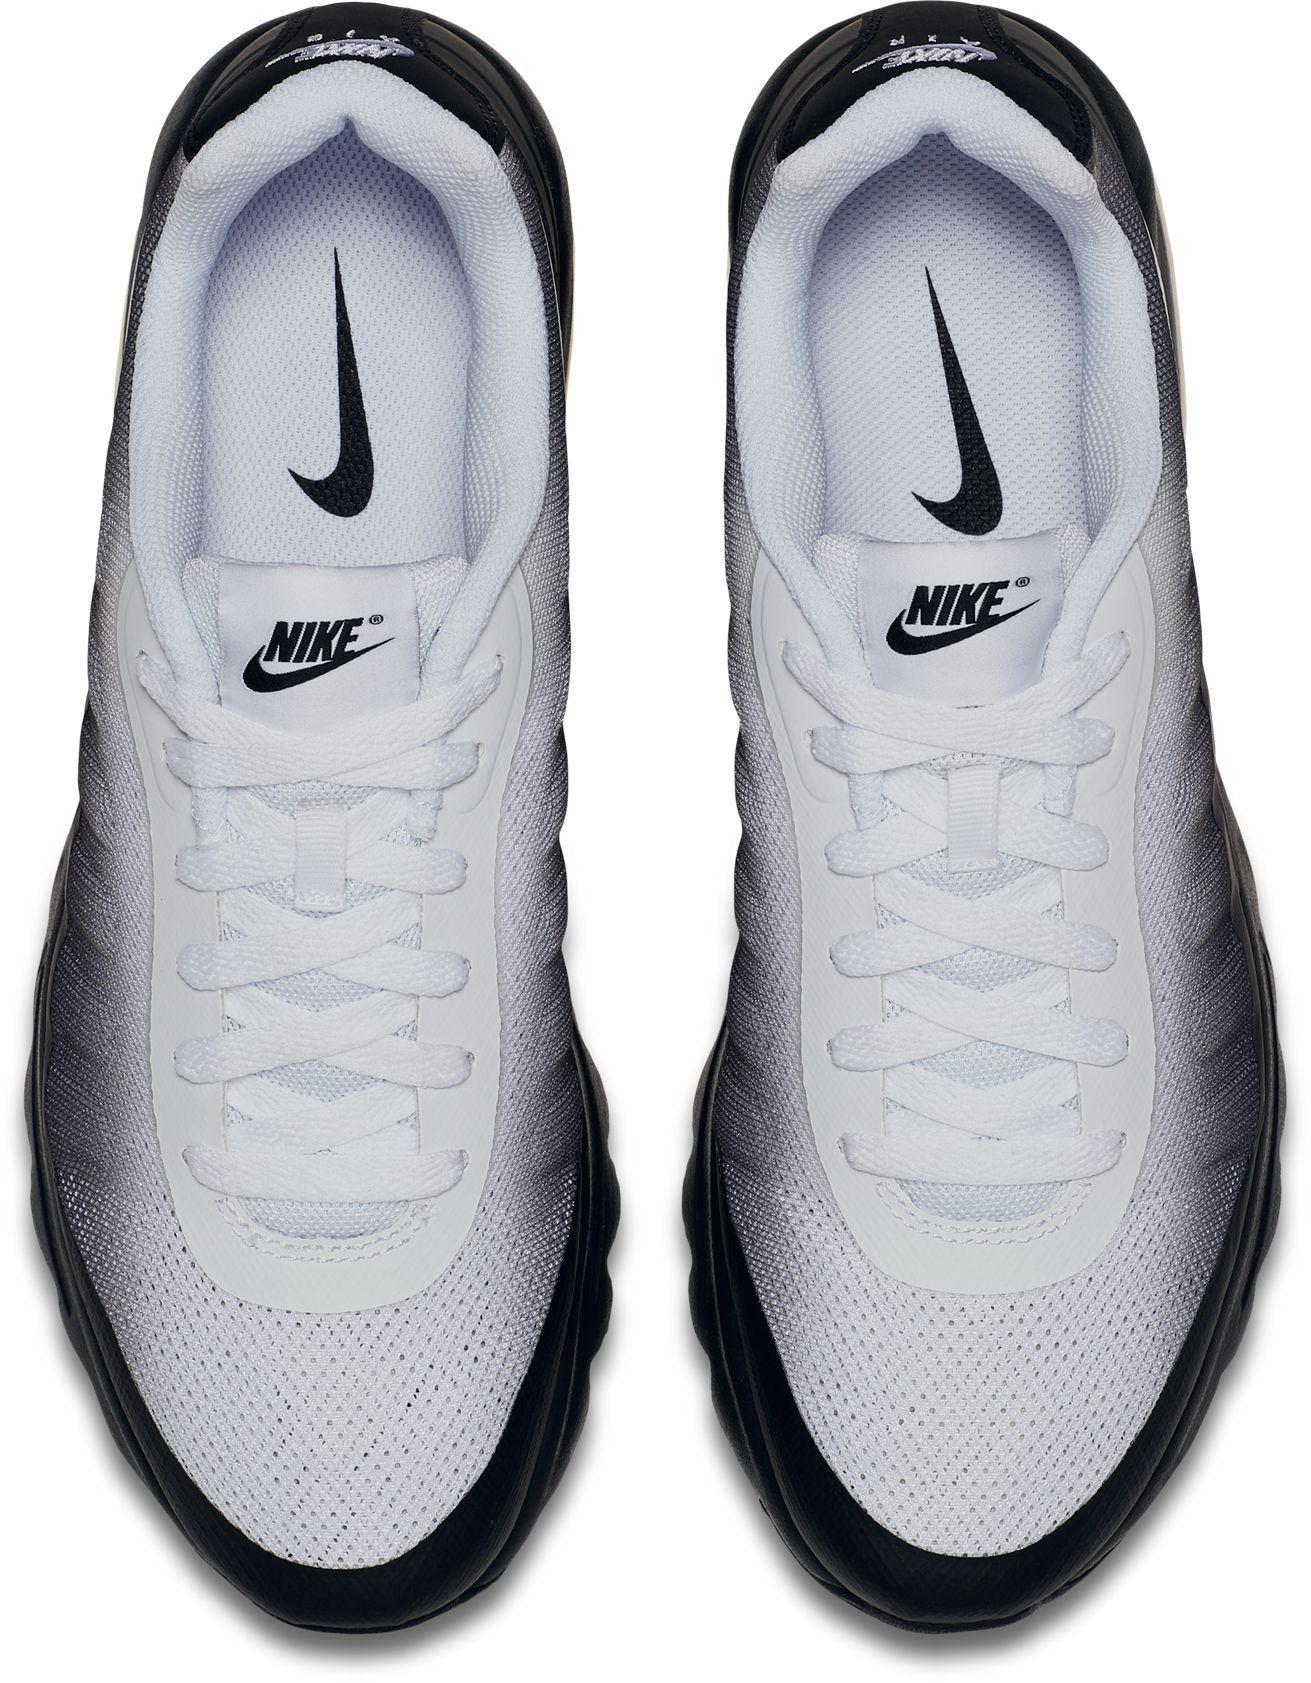 pretty nice b0371 a26ae Nike Air Max Invigor Prt Shoes in Black for Men - Lyst